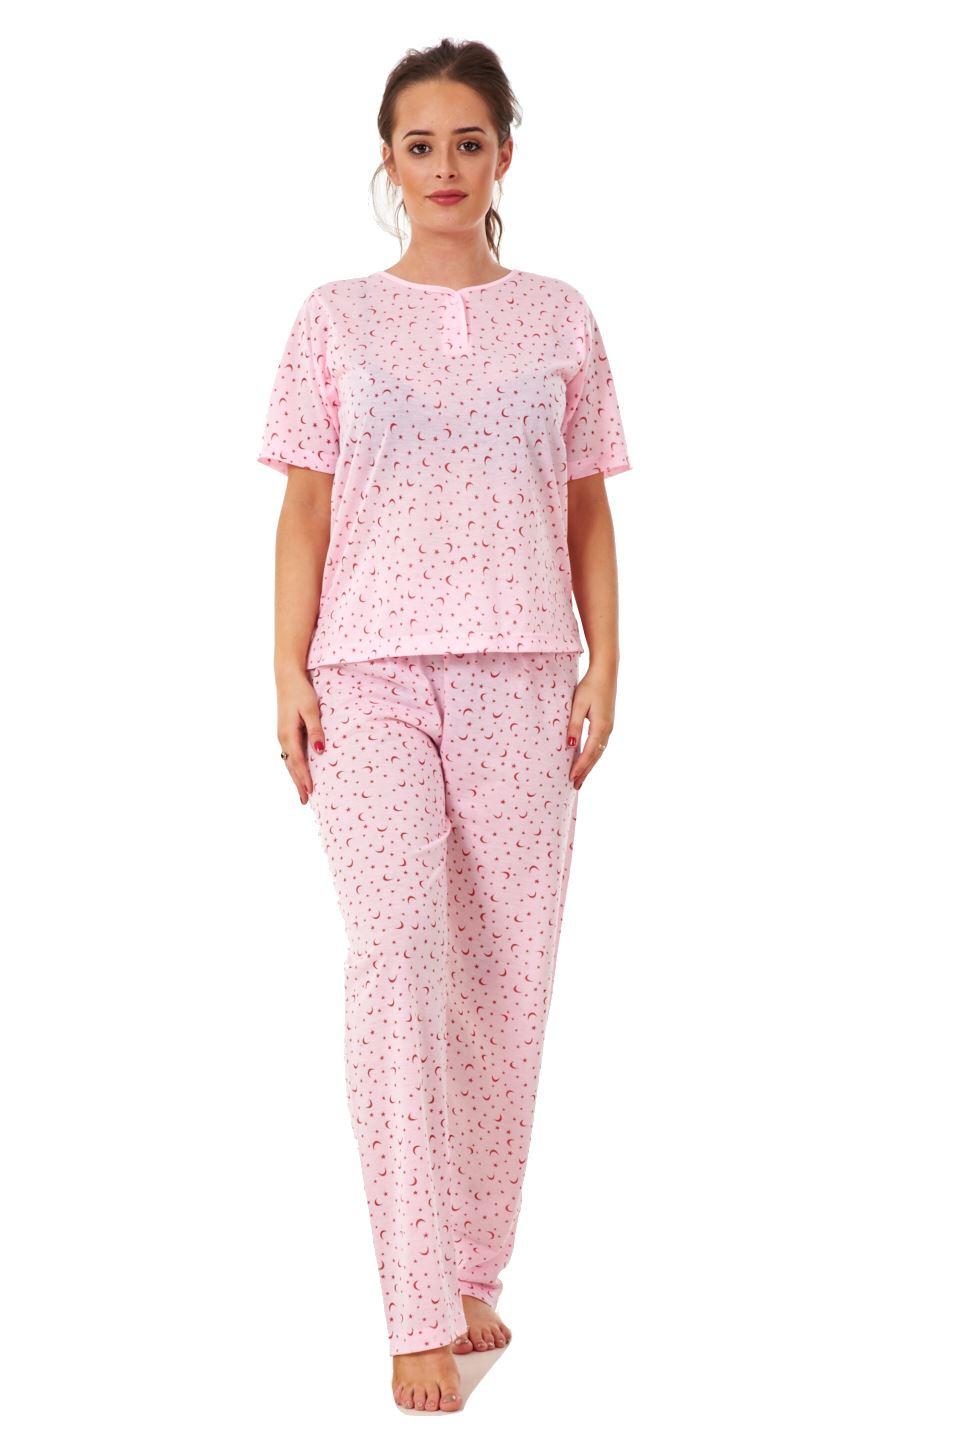 Ladies-Pyjama-Sets-New-Stars-Moon-Printed-Short-Sleeve-Nightwear-Soft-PJs-S-XXL